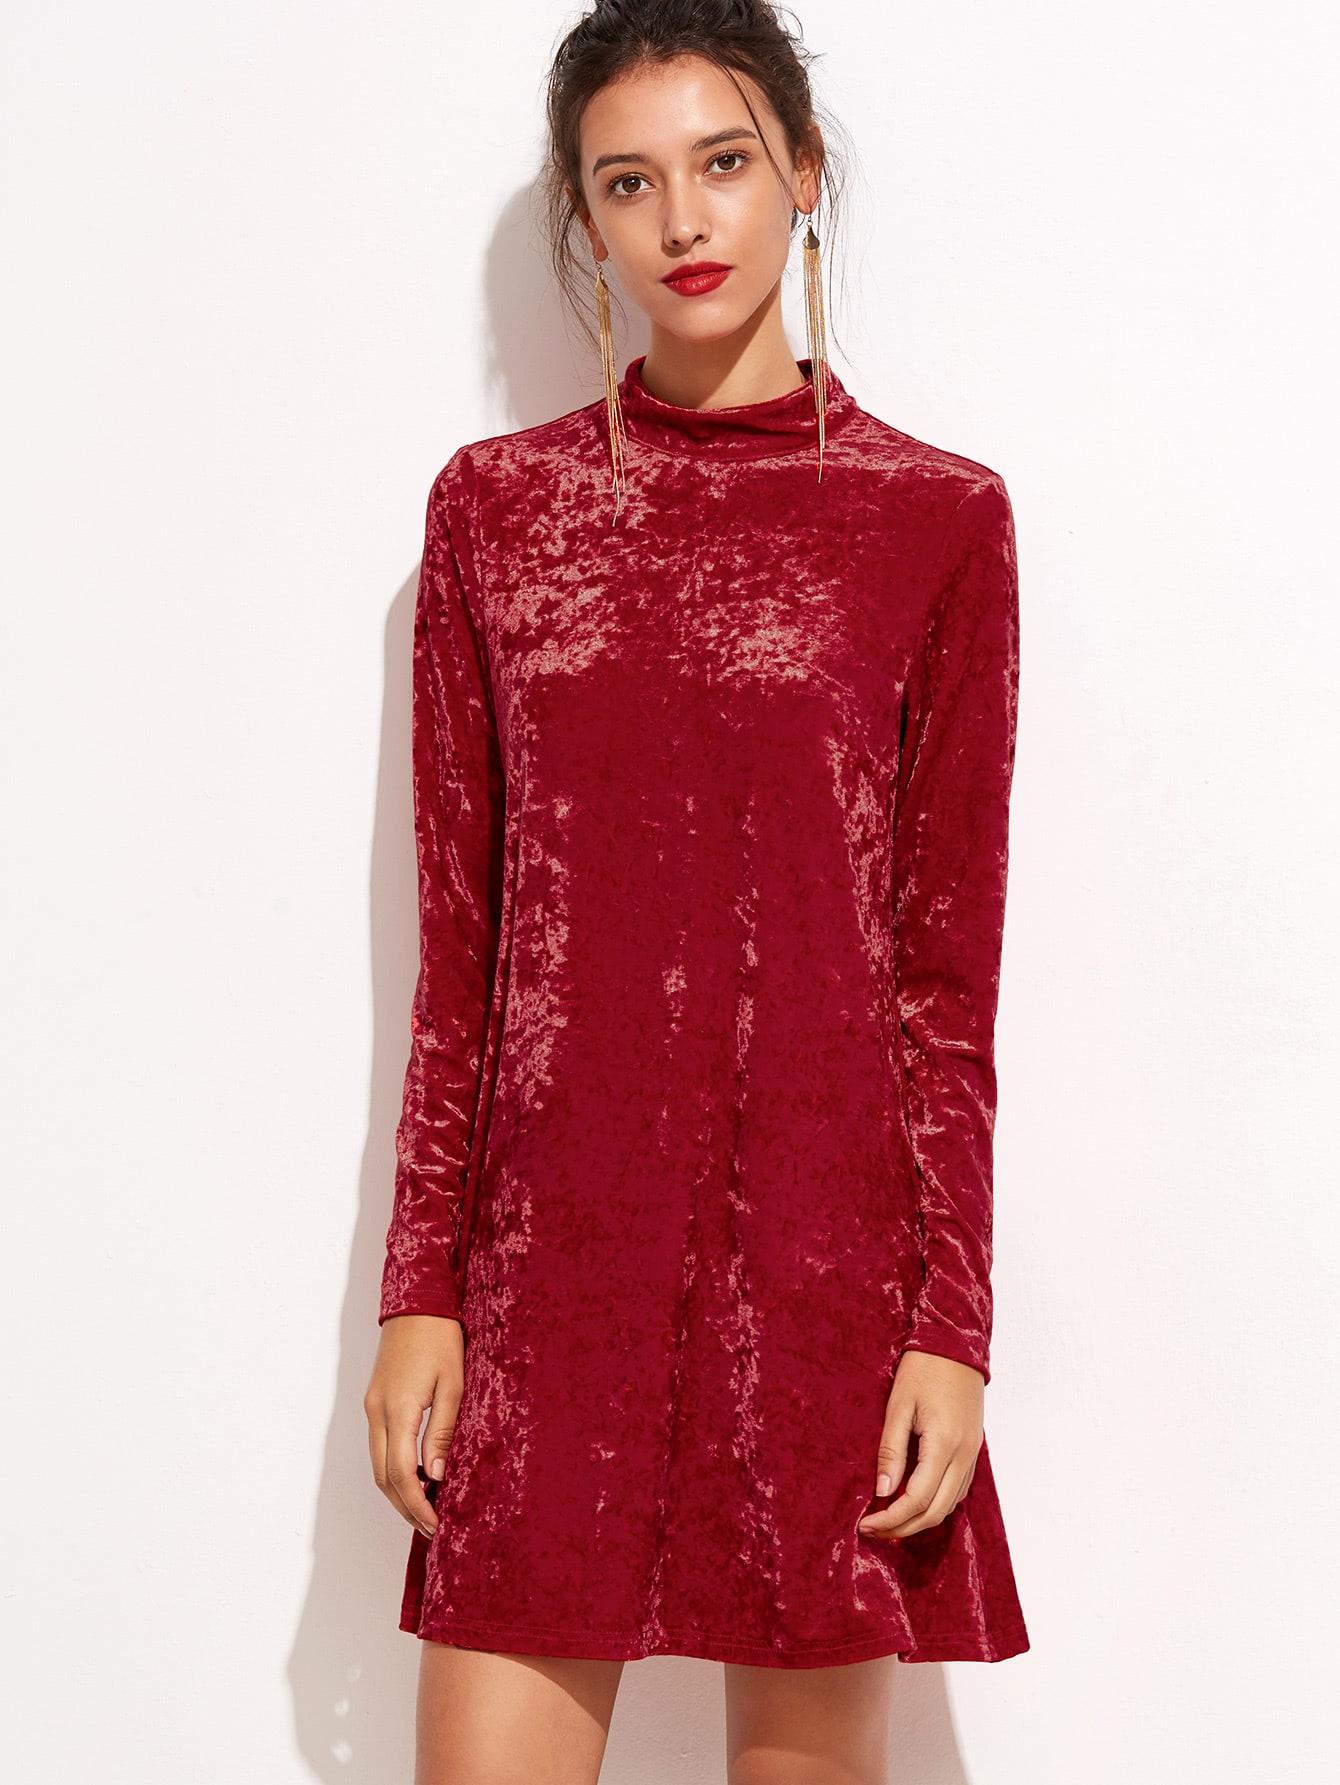 Red Mock Neck Keyhole Velvet DressRed Mock Neck Keyhole Velvet Dress<br><br>color: Red<br>size: L,M,XS